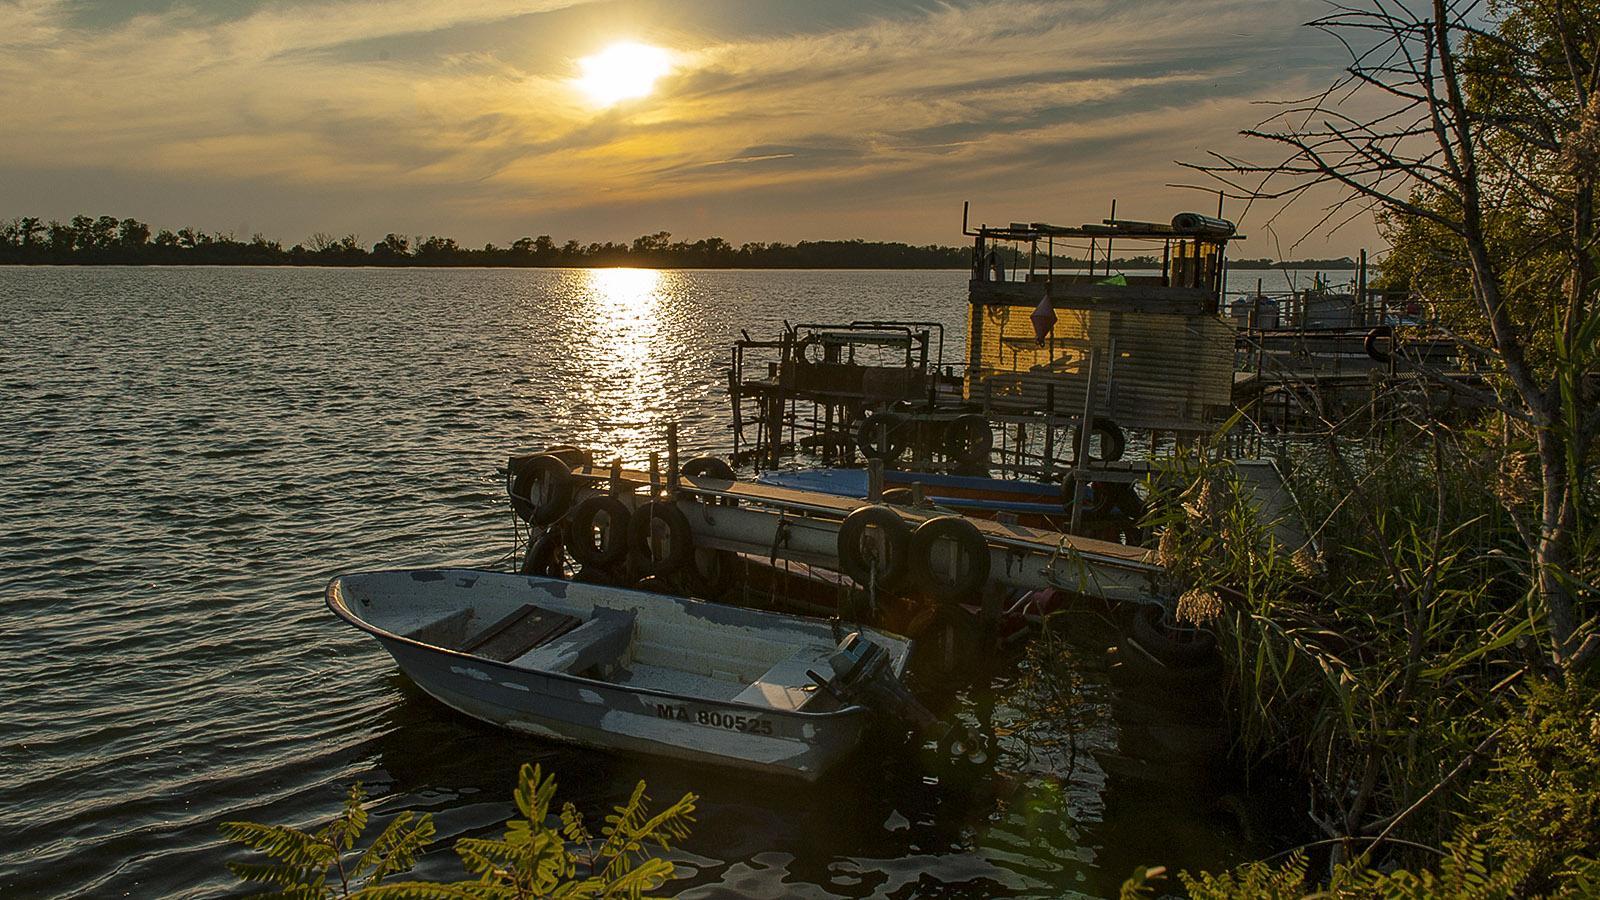 Sonnenuntergang über der Rhône in Port Saint-Louis-du-Rhône. Foto: Hilke Maunder